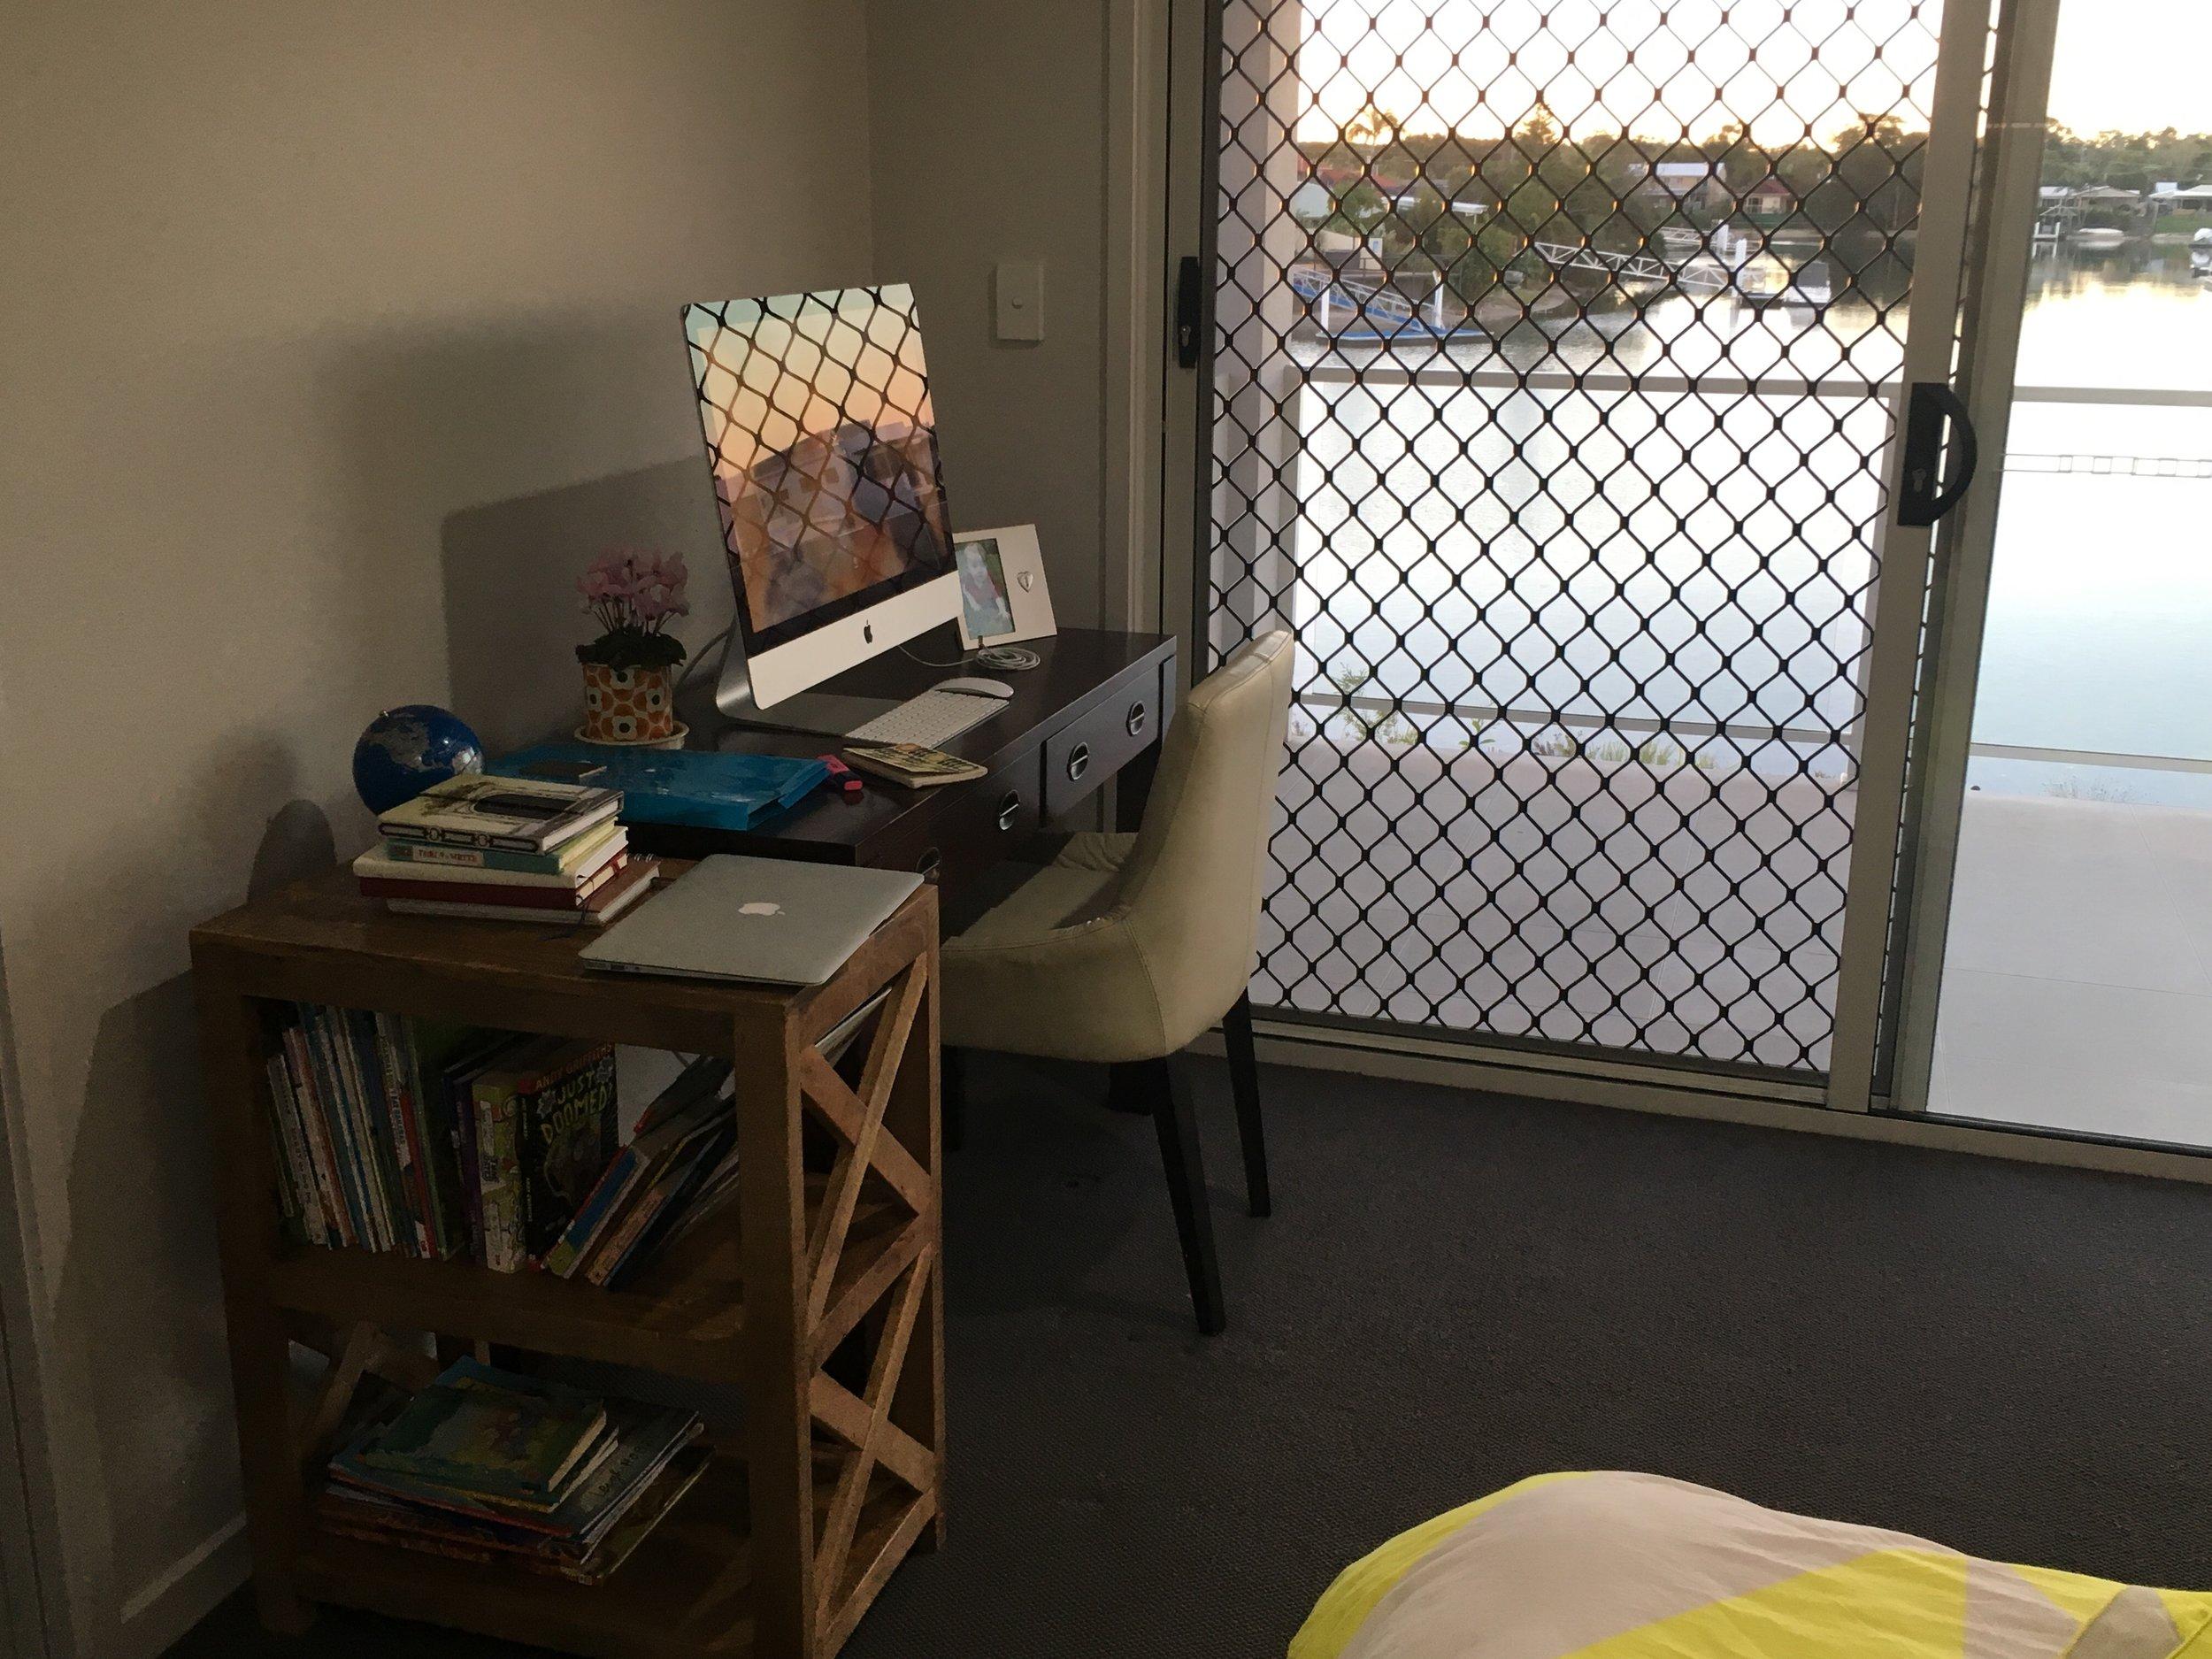 Noble_Rachel_Workspace2 (1).png